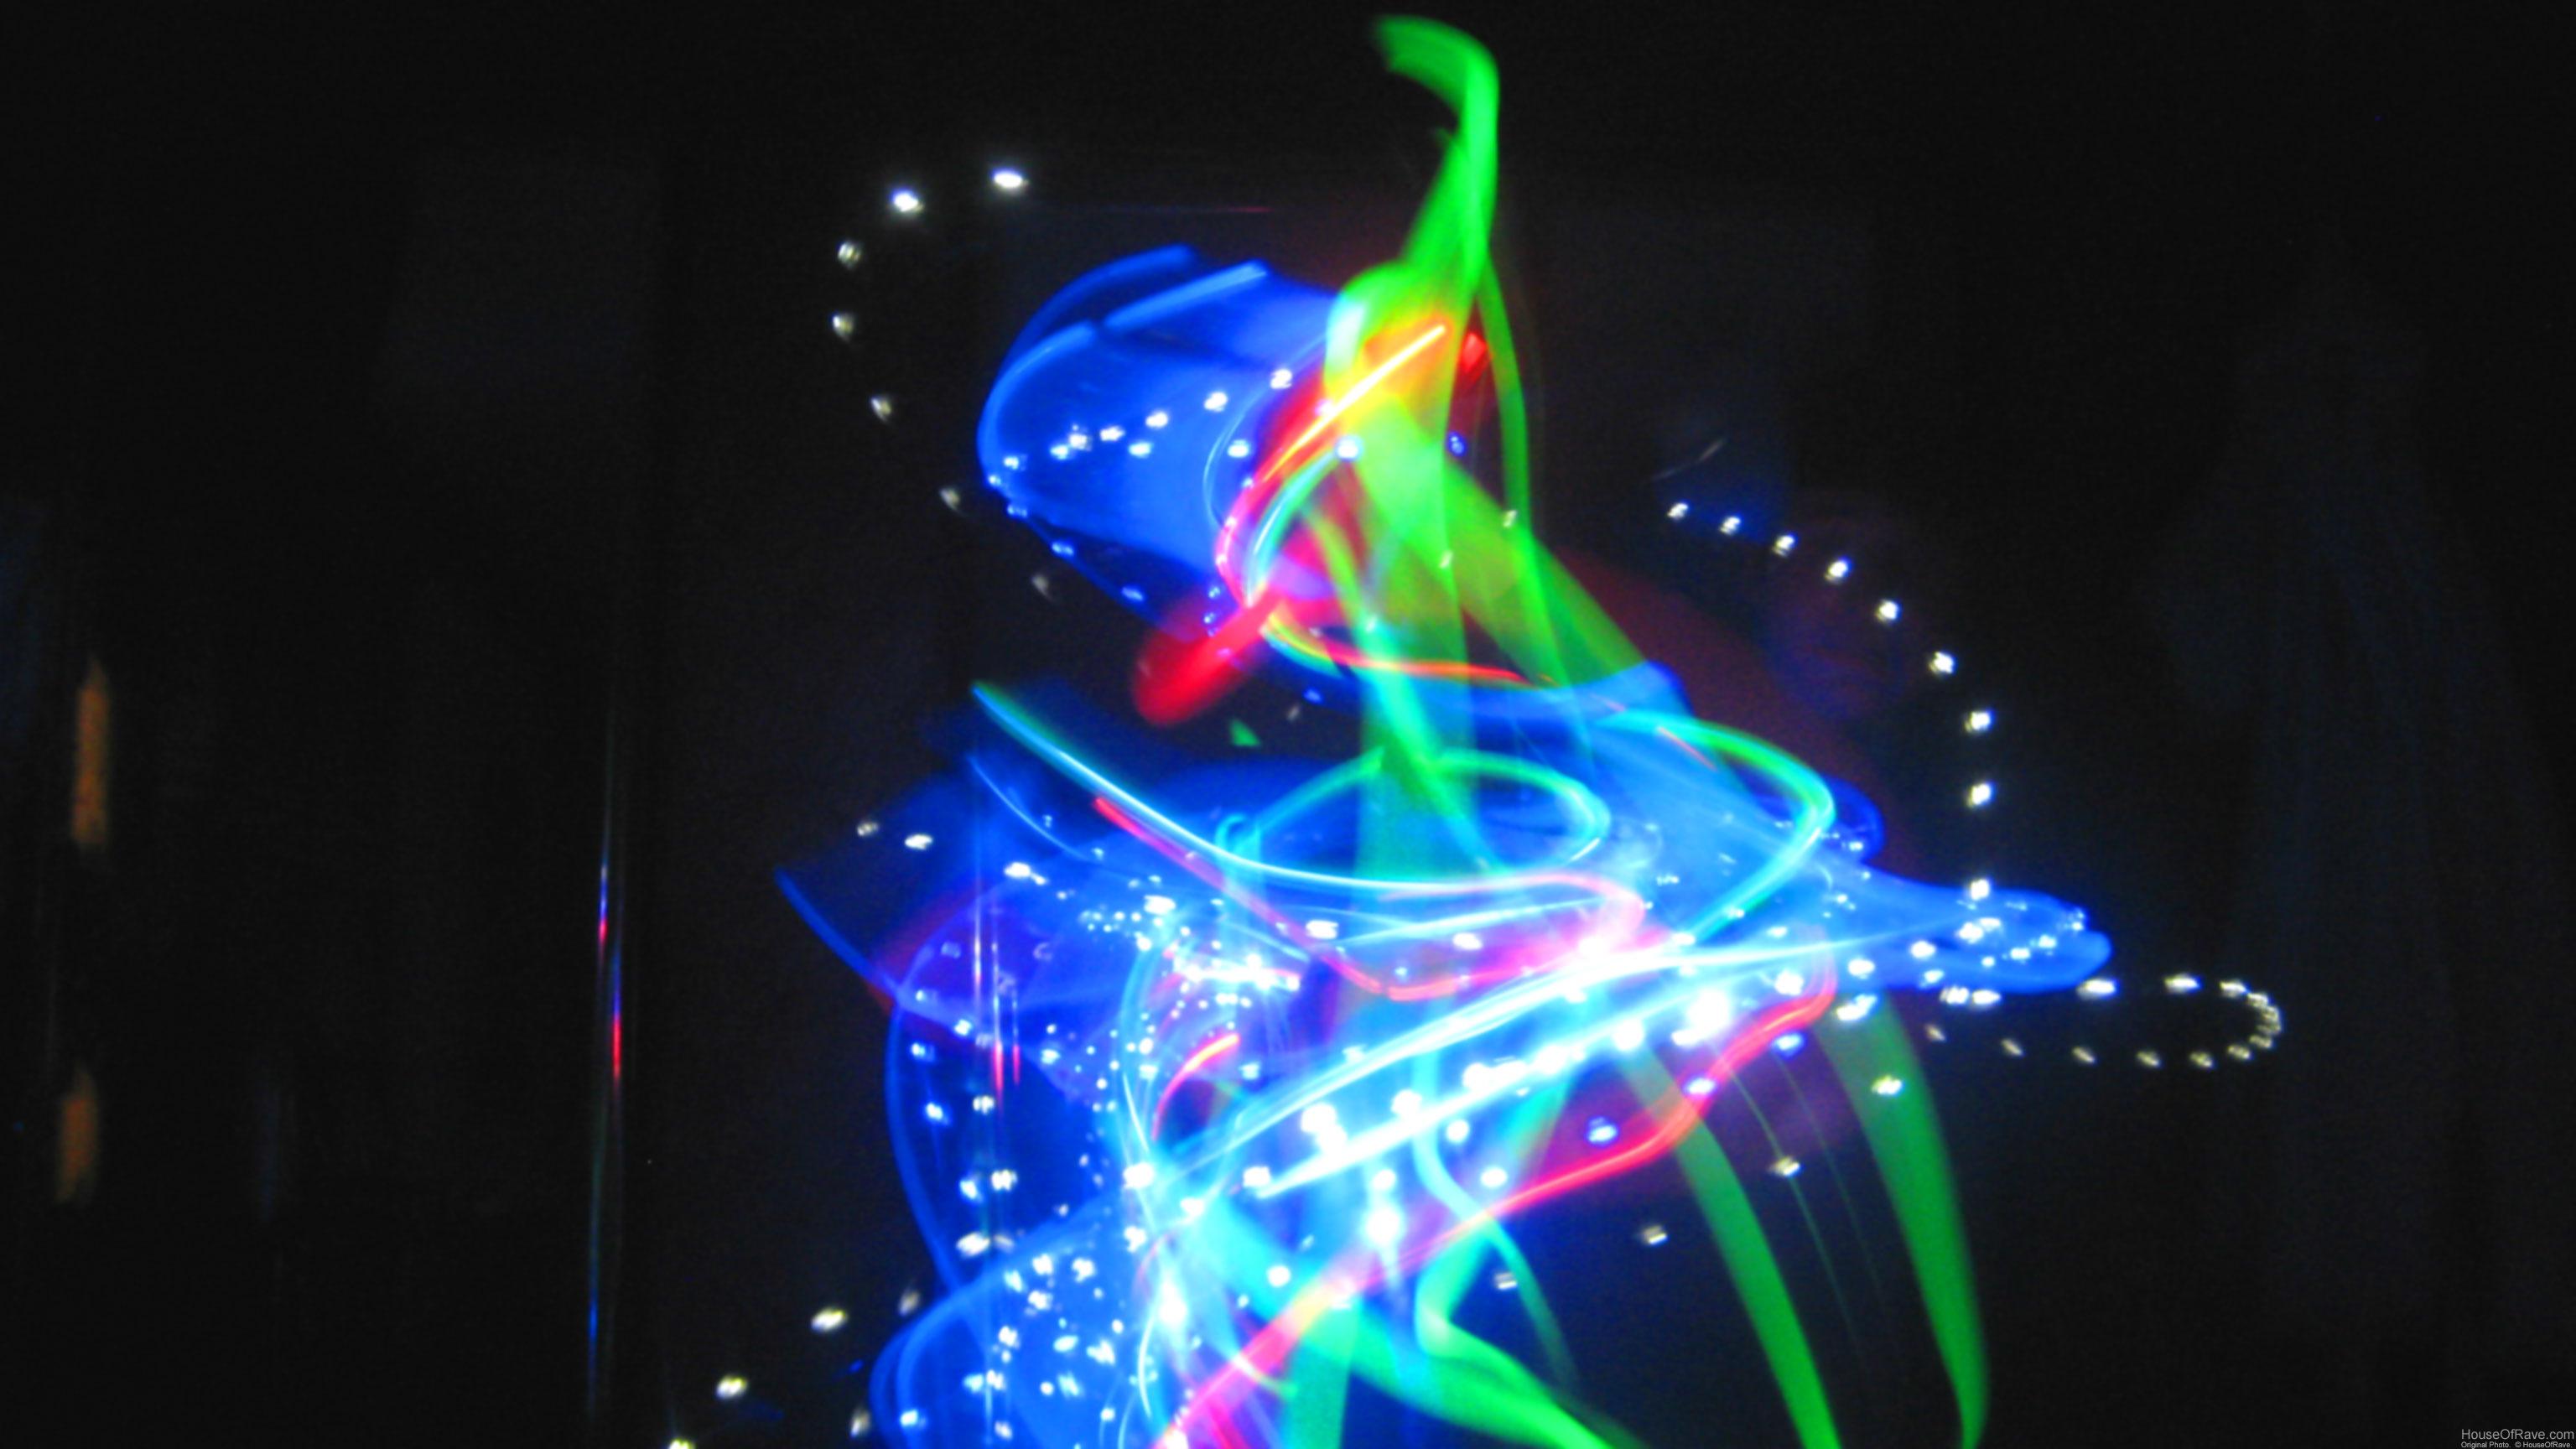 Rave Lights Wallpaper